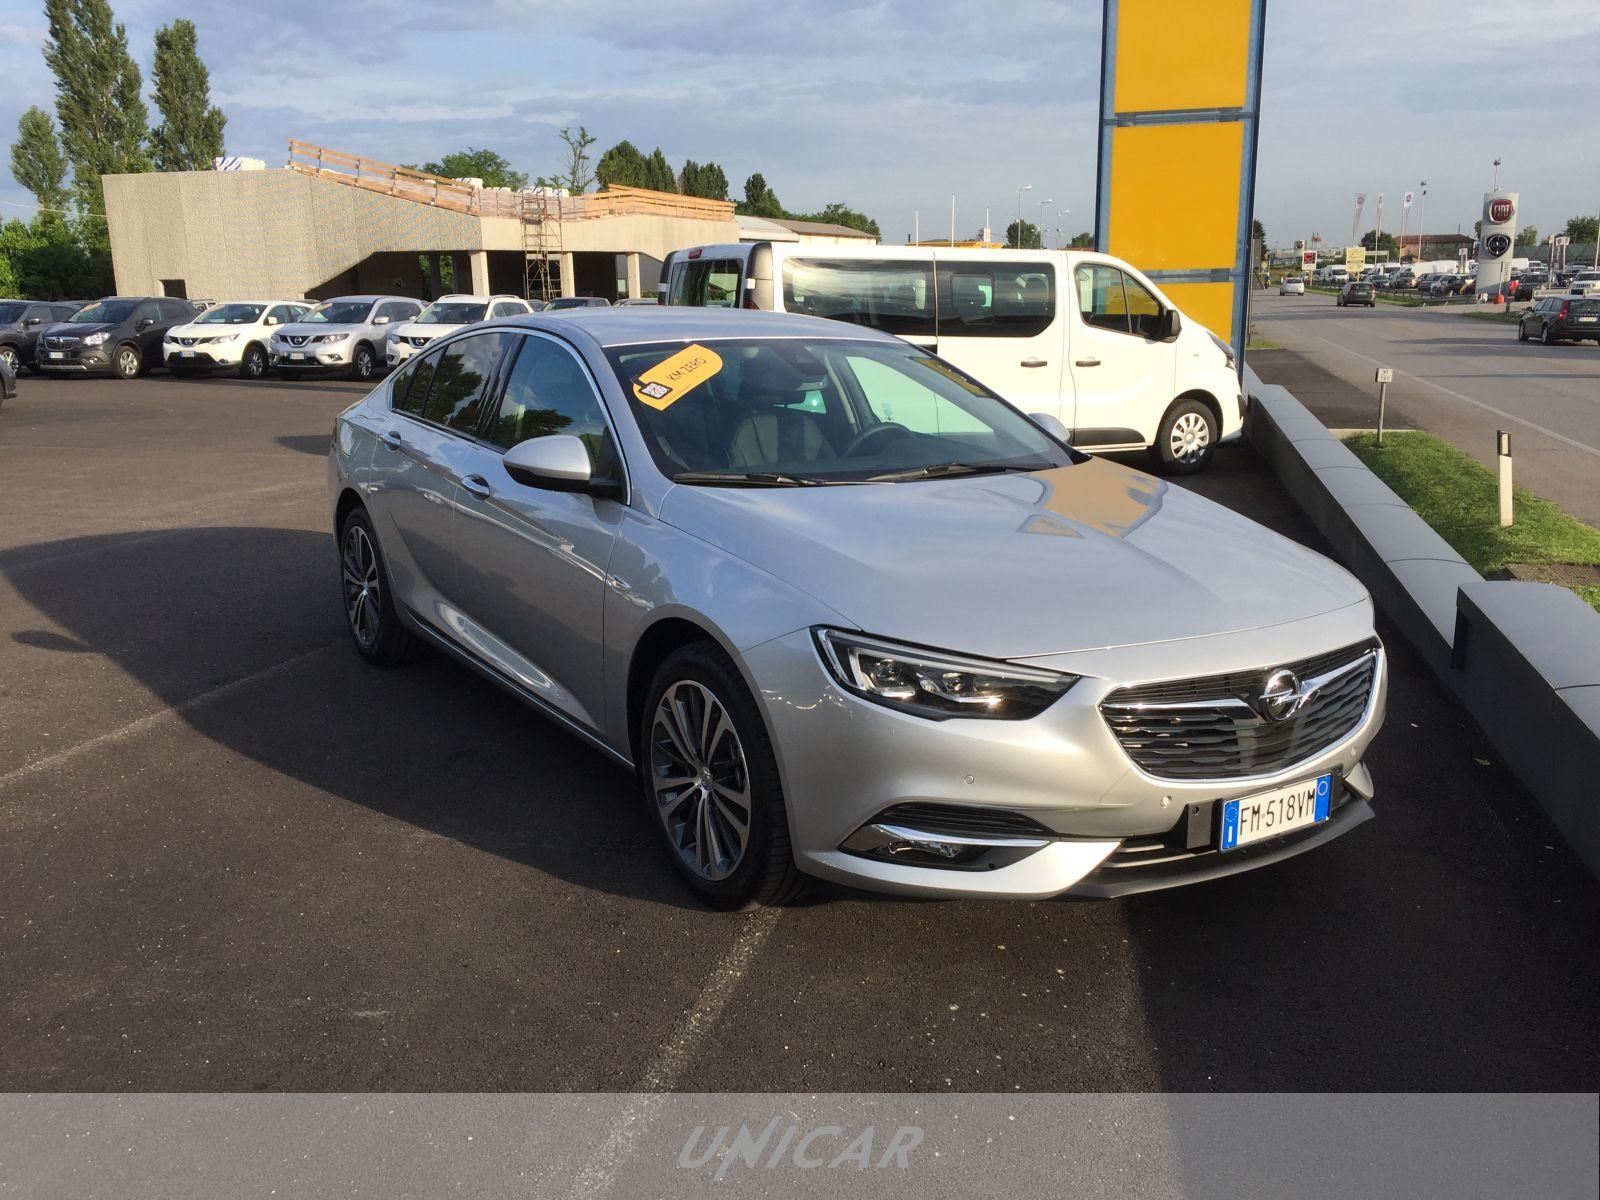 UNICAR Opel Insignia